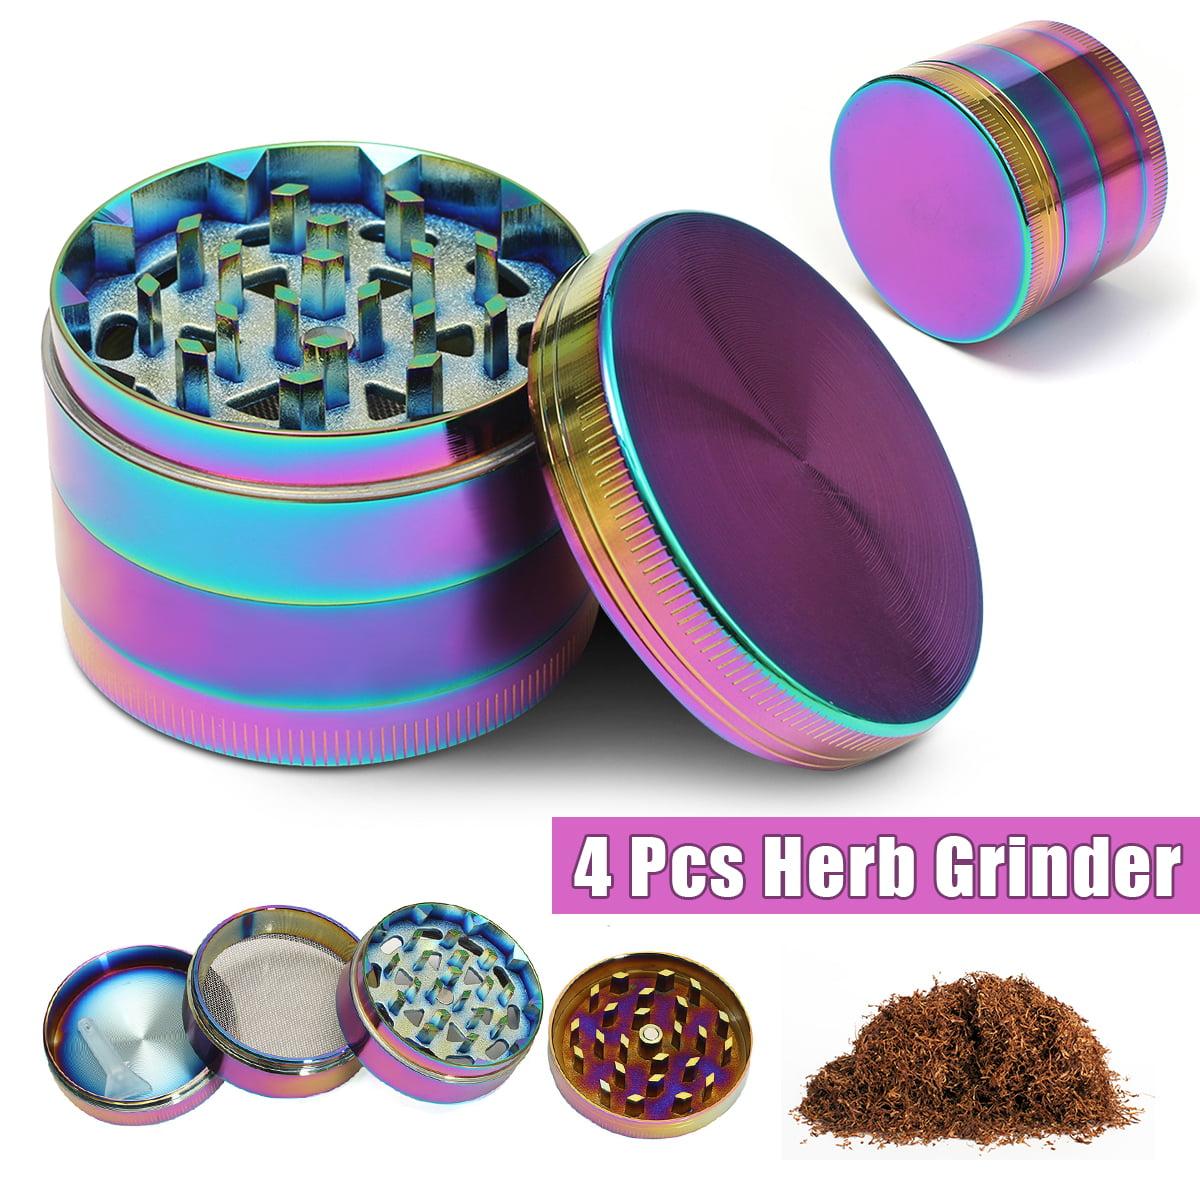 "2"" 4 Layer Metal Zinc alloy Tobacco Herb Grinder Smoke Crusher with Pollen Sifter & Bonus Scraper Rainbow... by"